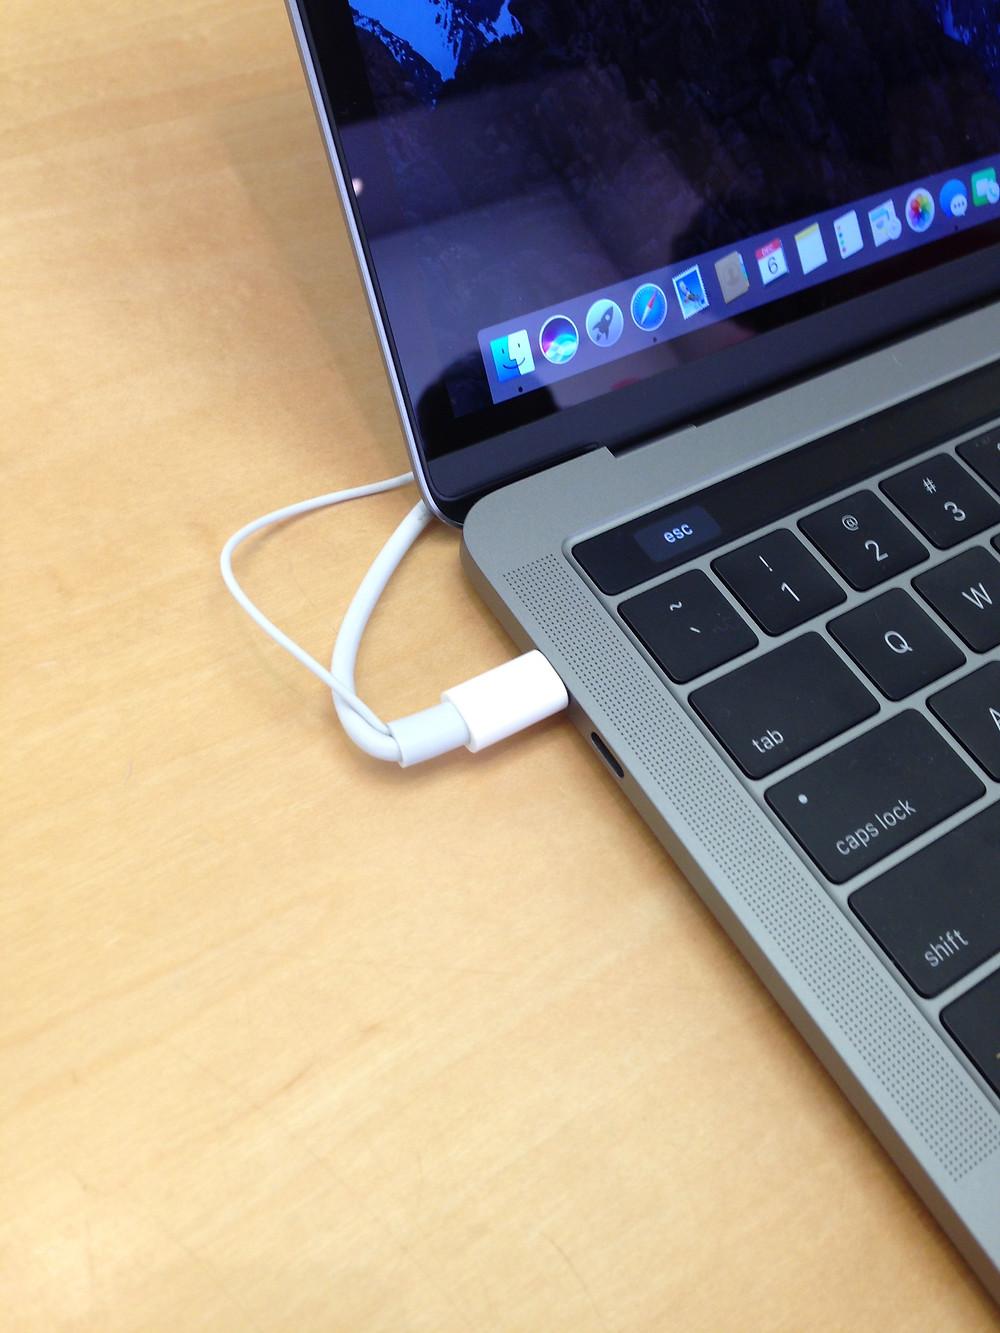 Image: 2016 MacBook Pro with USB-C. Image Credit: XYZ Media Group